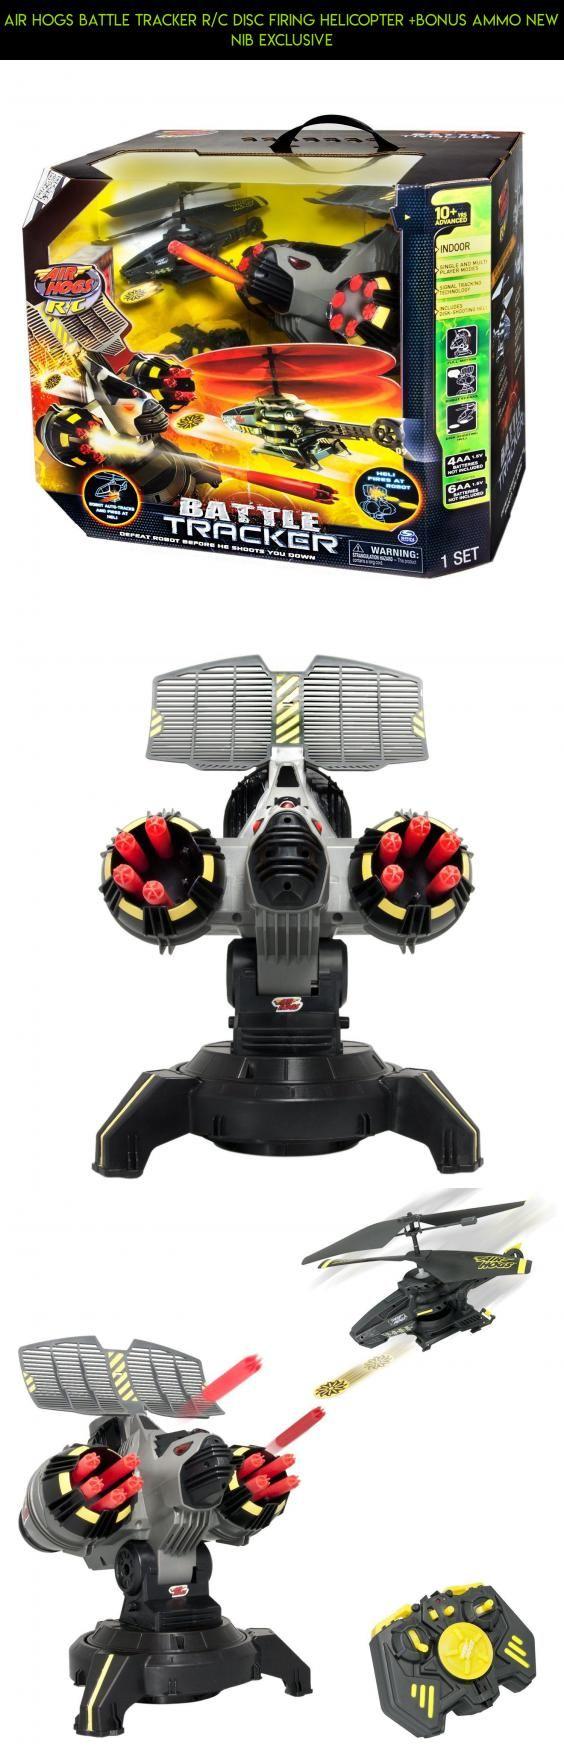 Air Hogs Battle Tracker R/C Disc Firing Helicopter +Bonus